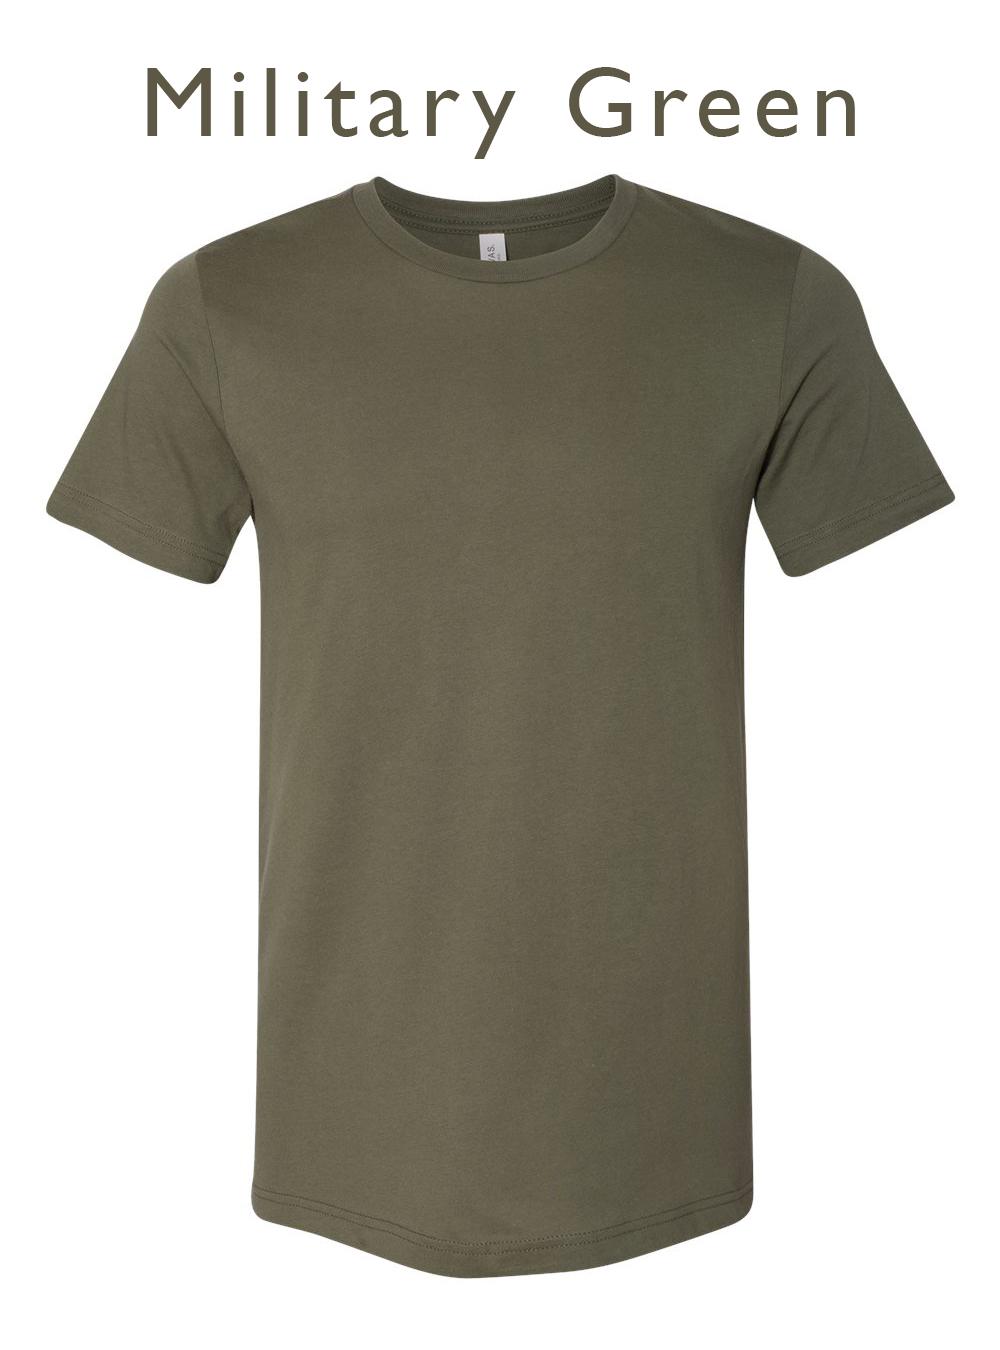 Military Green.jpg